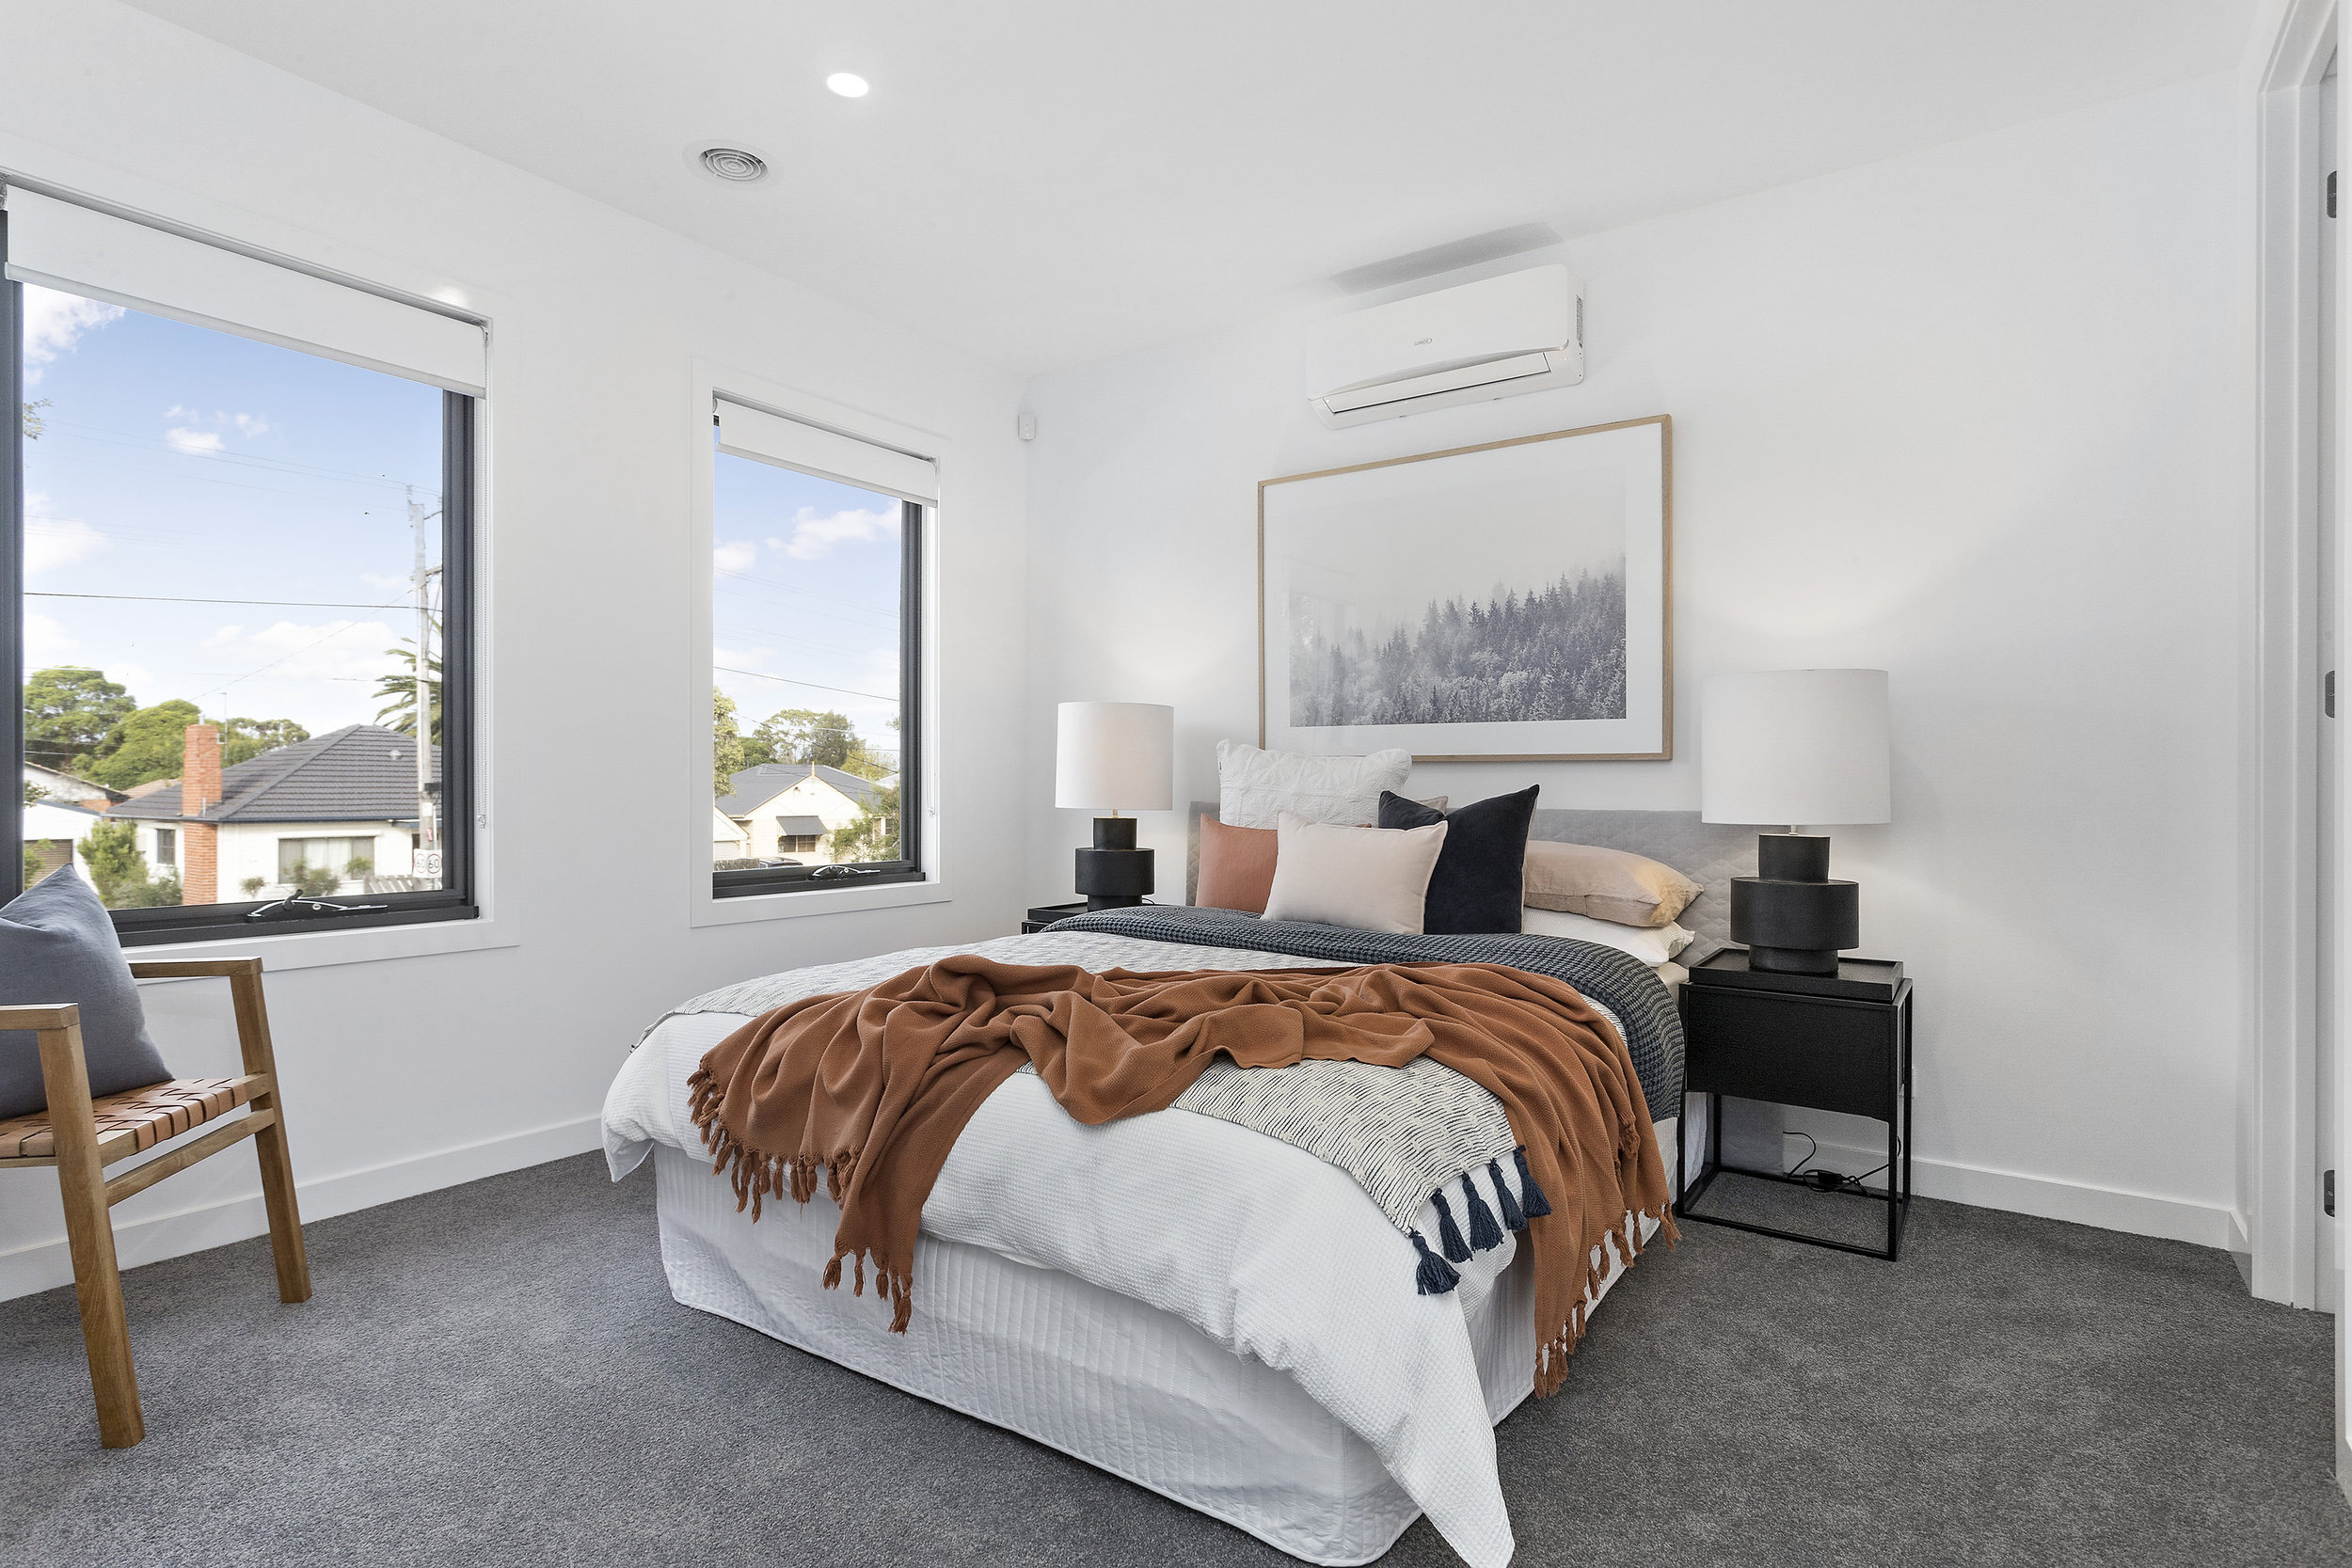 21-Bedroom.jpg